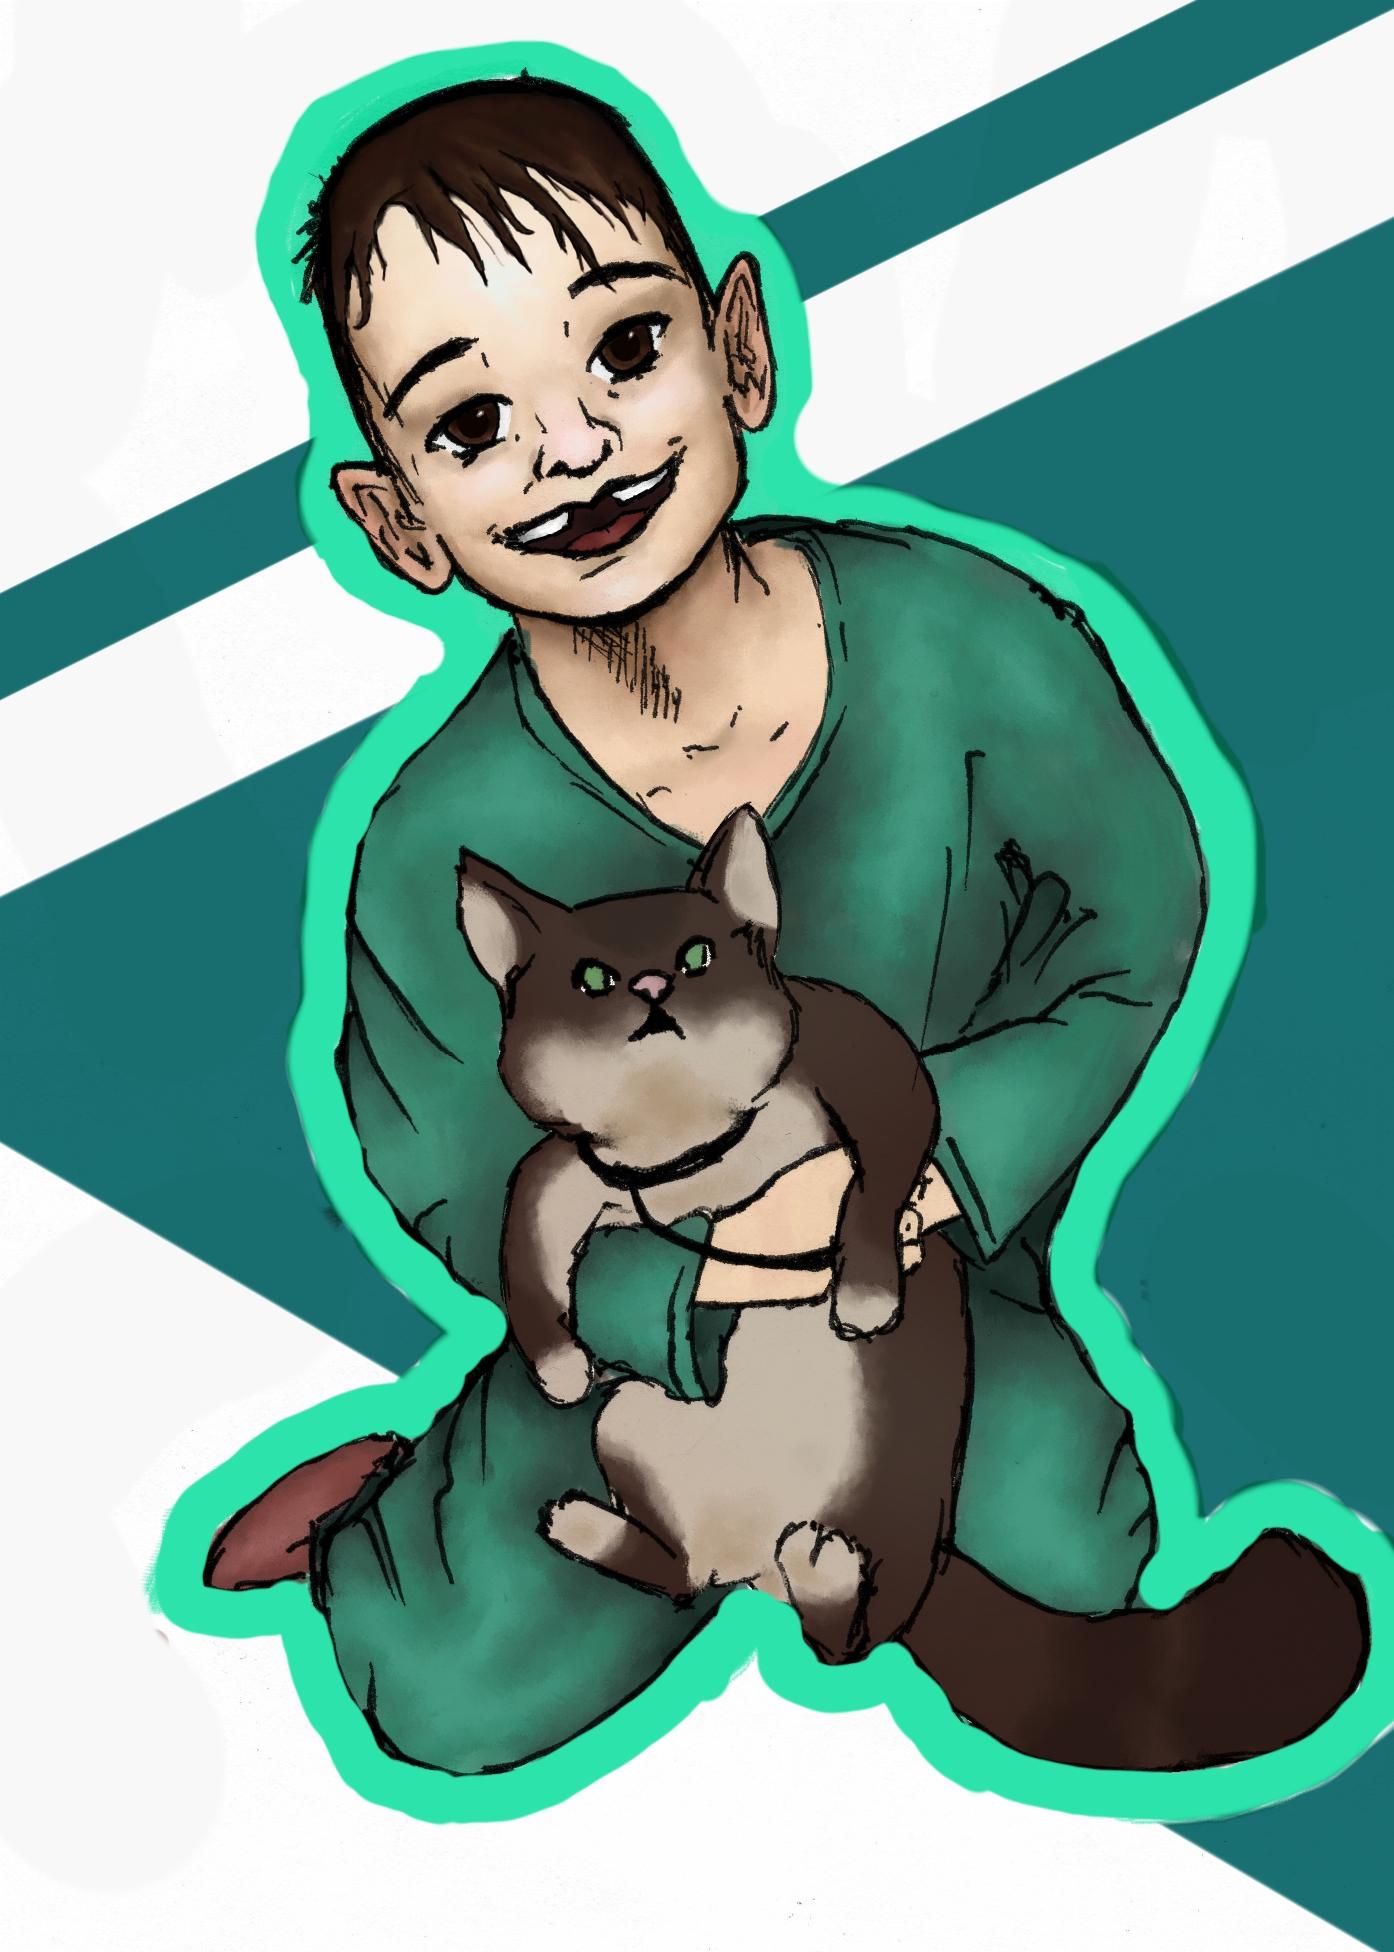 Me and cat Emi